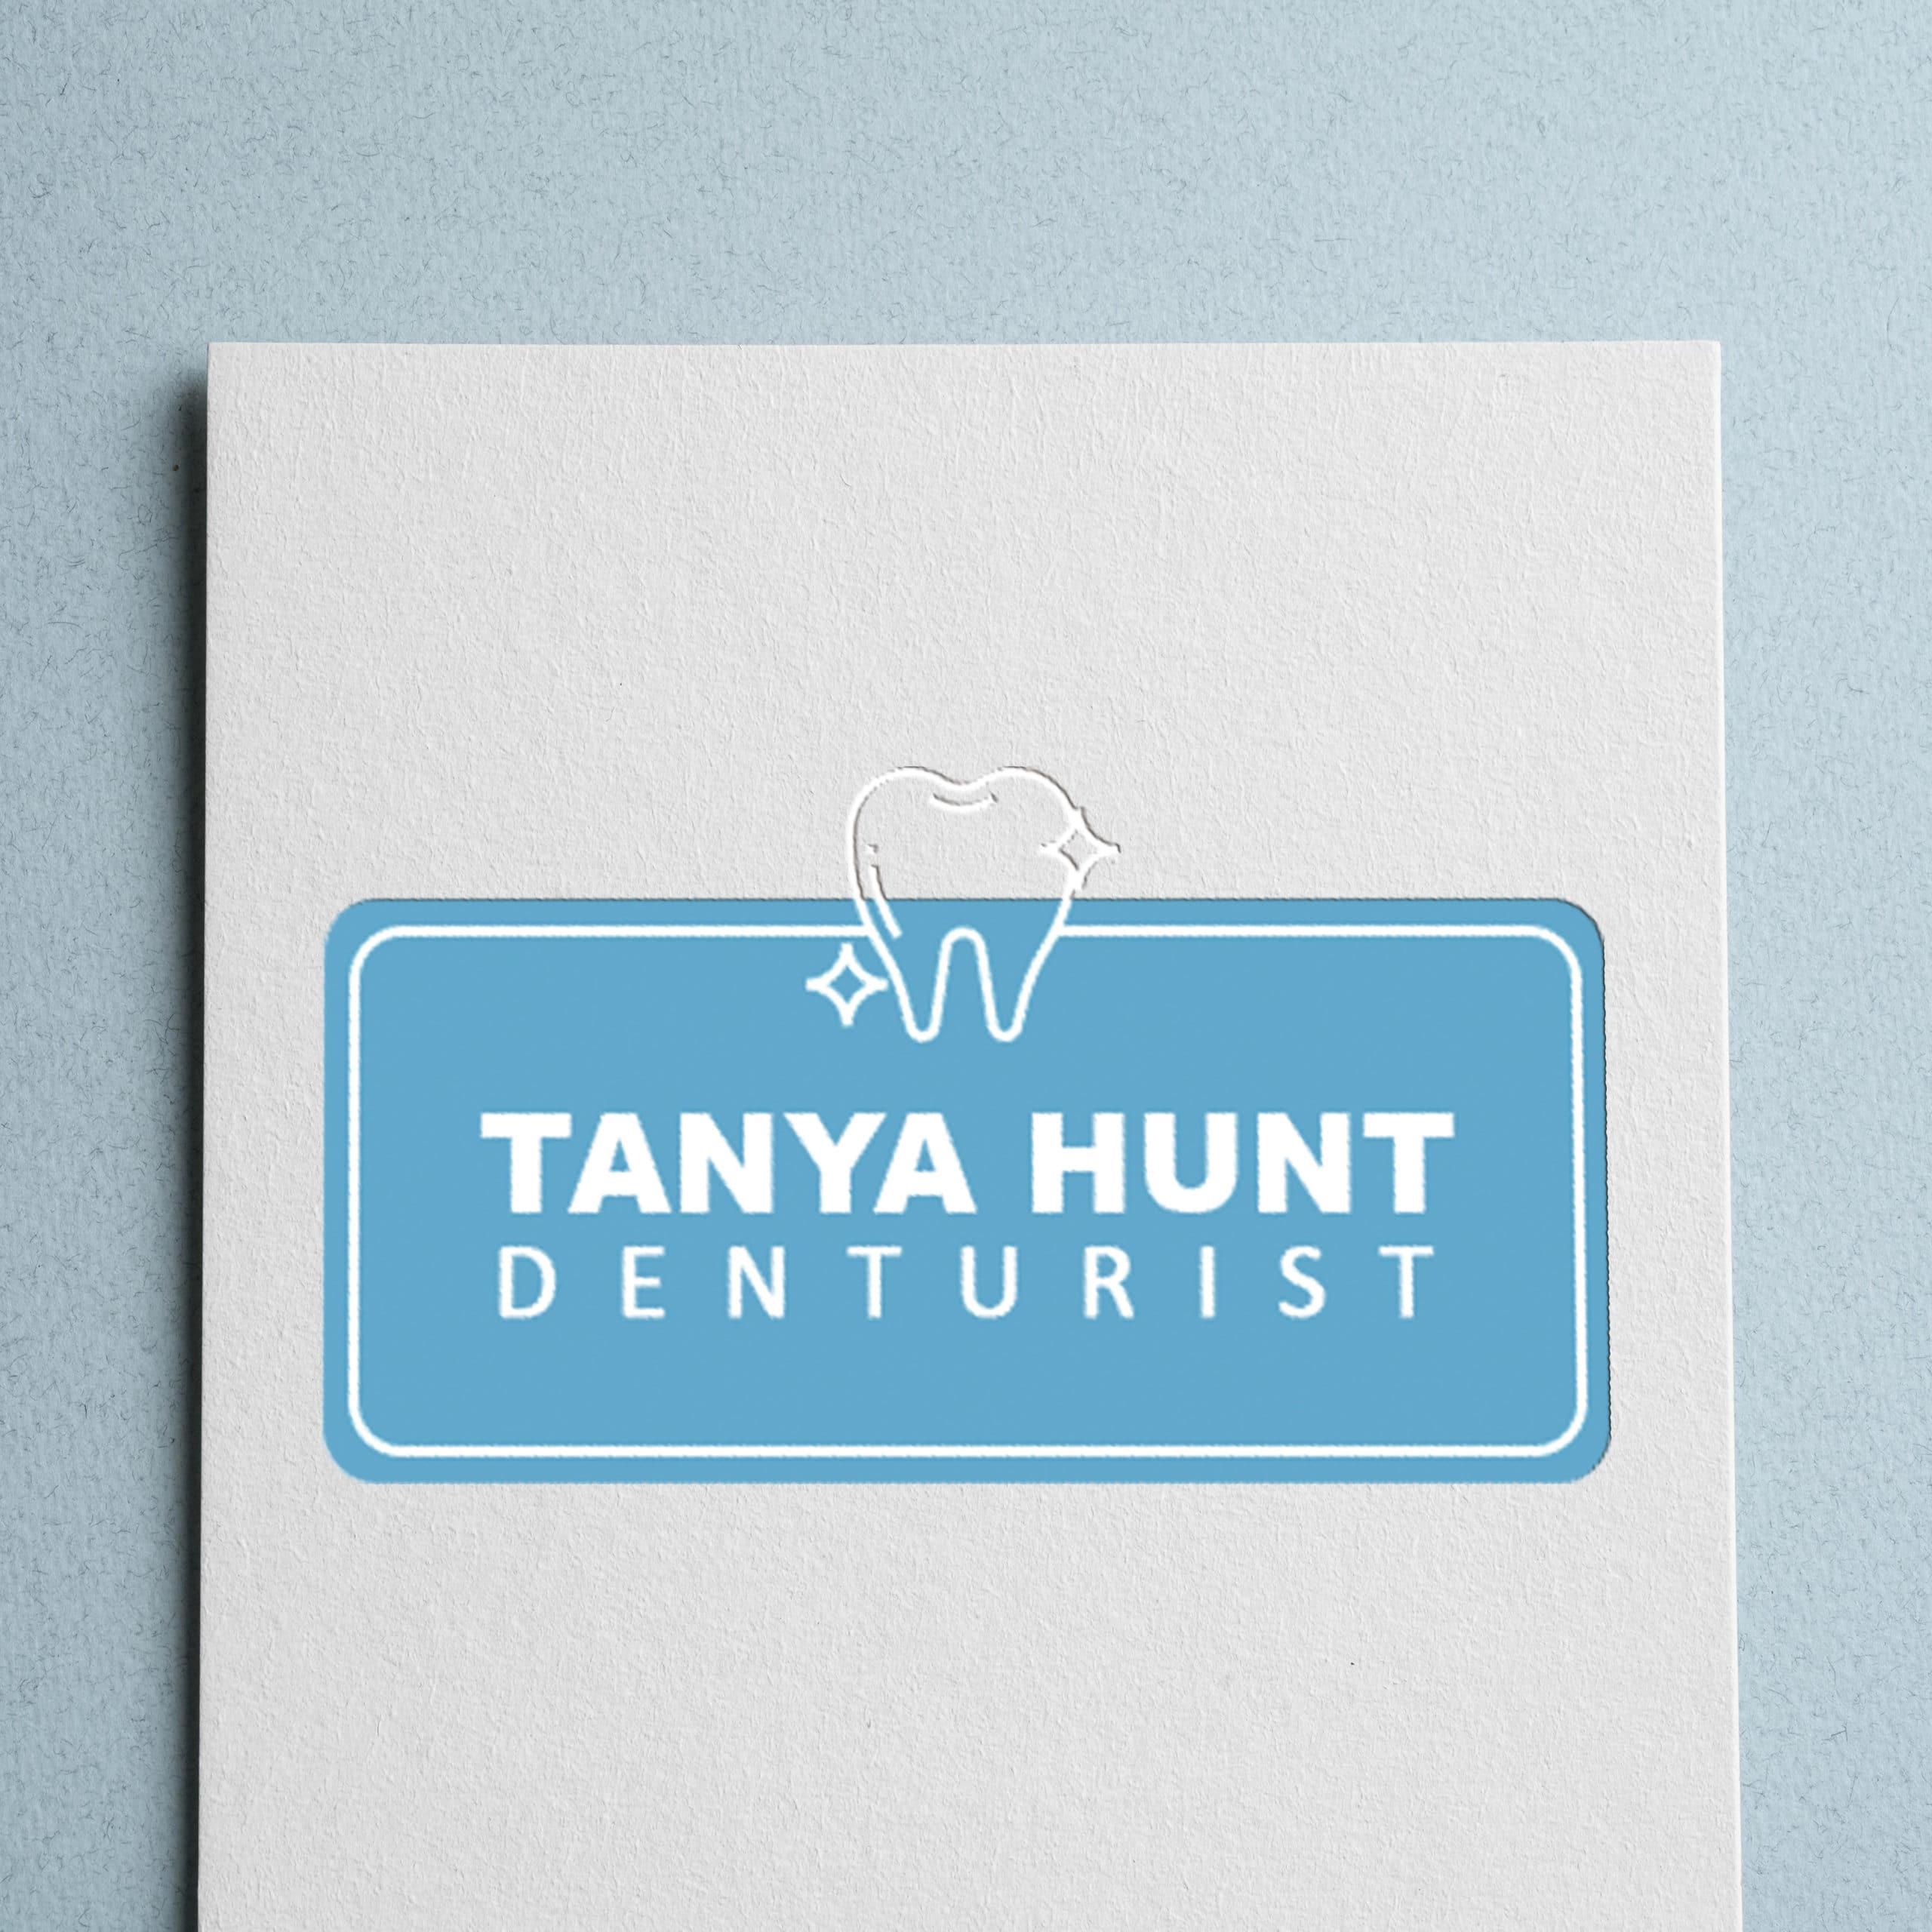 Tanya Hunt Denturist, Abbotsford